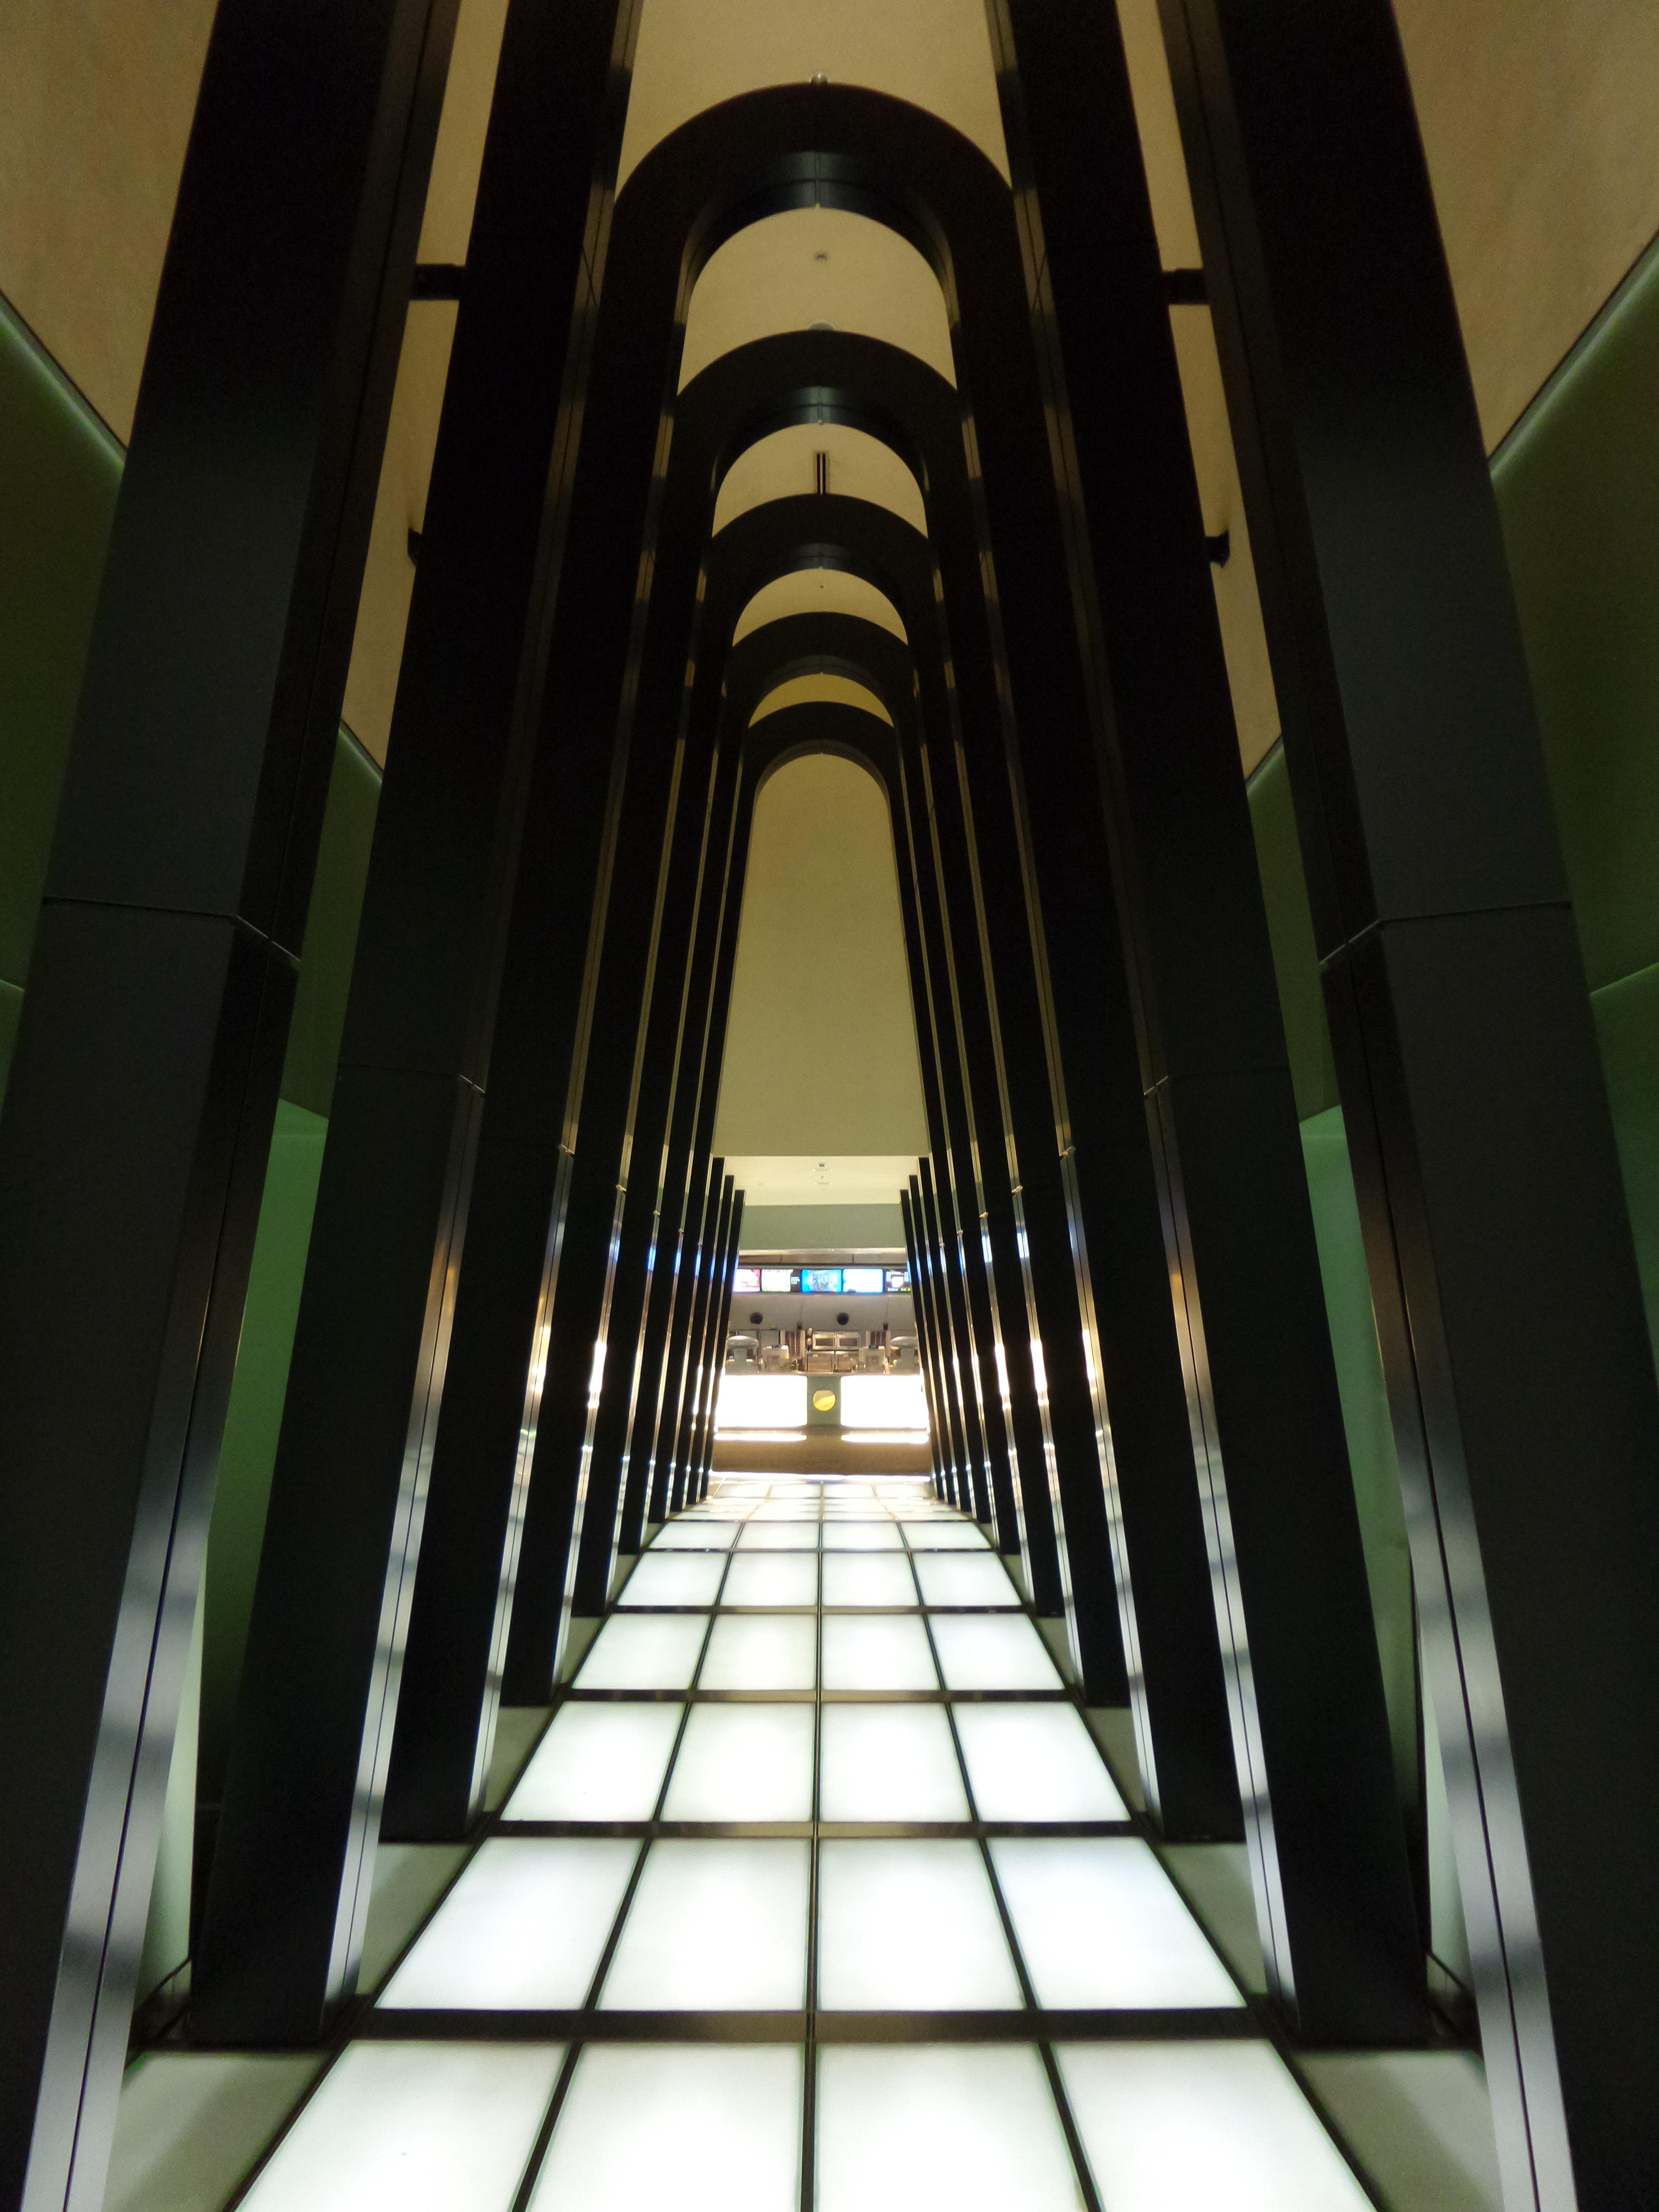 White and Black Hallway